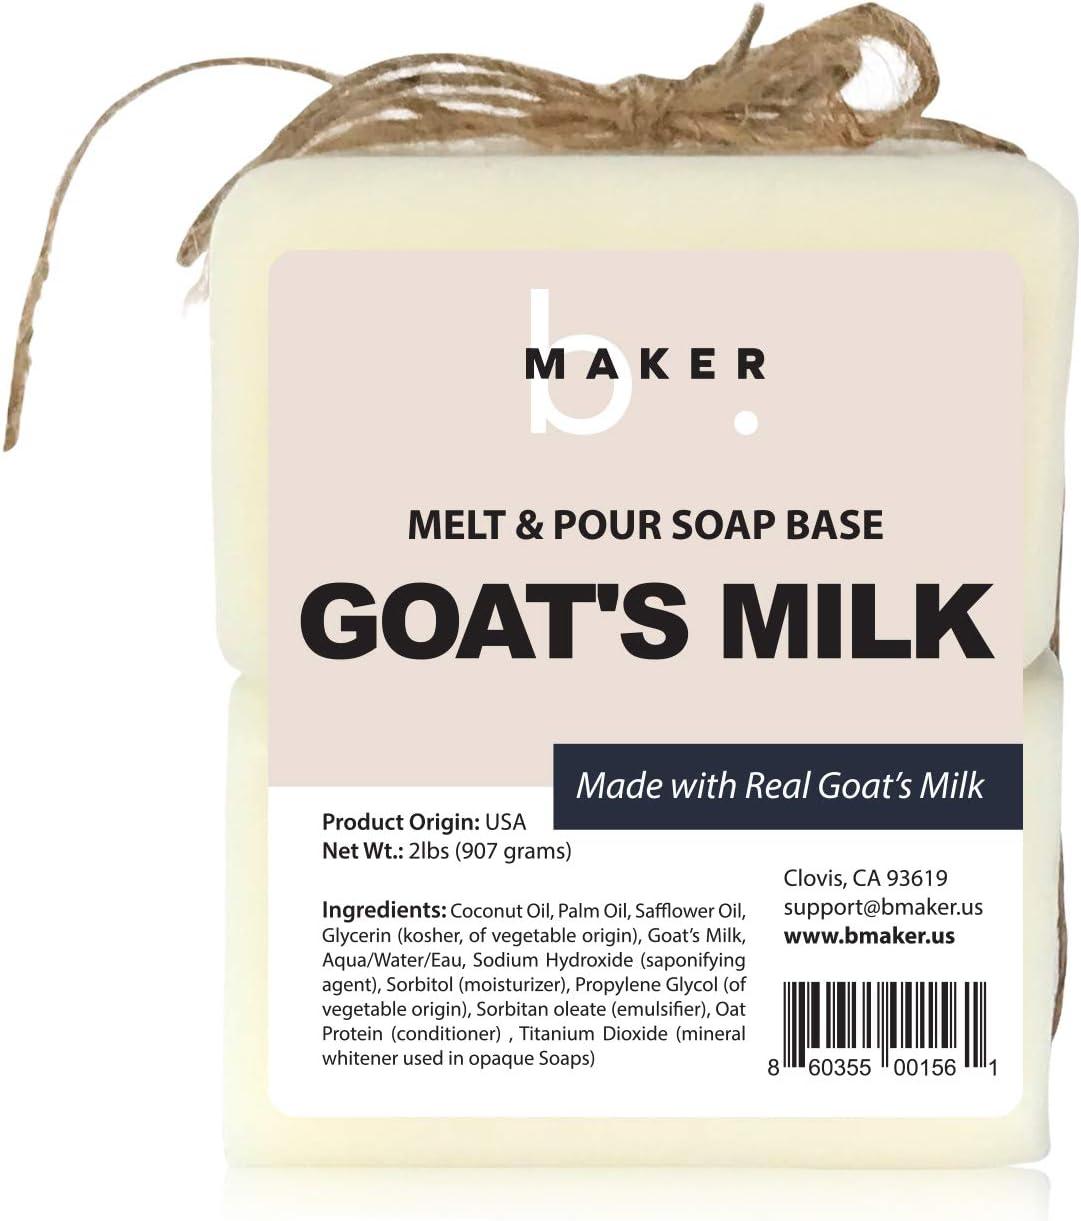 bMAKER All-Natural Goats Milk Melt and Pour Soap Base (2lb Blocks) - Moisturizing and Nourishing for Skin, Soap Making Supplies, Goat Milk Soap, Soap Base for Soap Making Melt and Pour